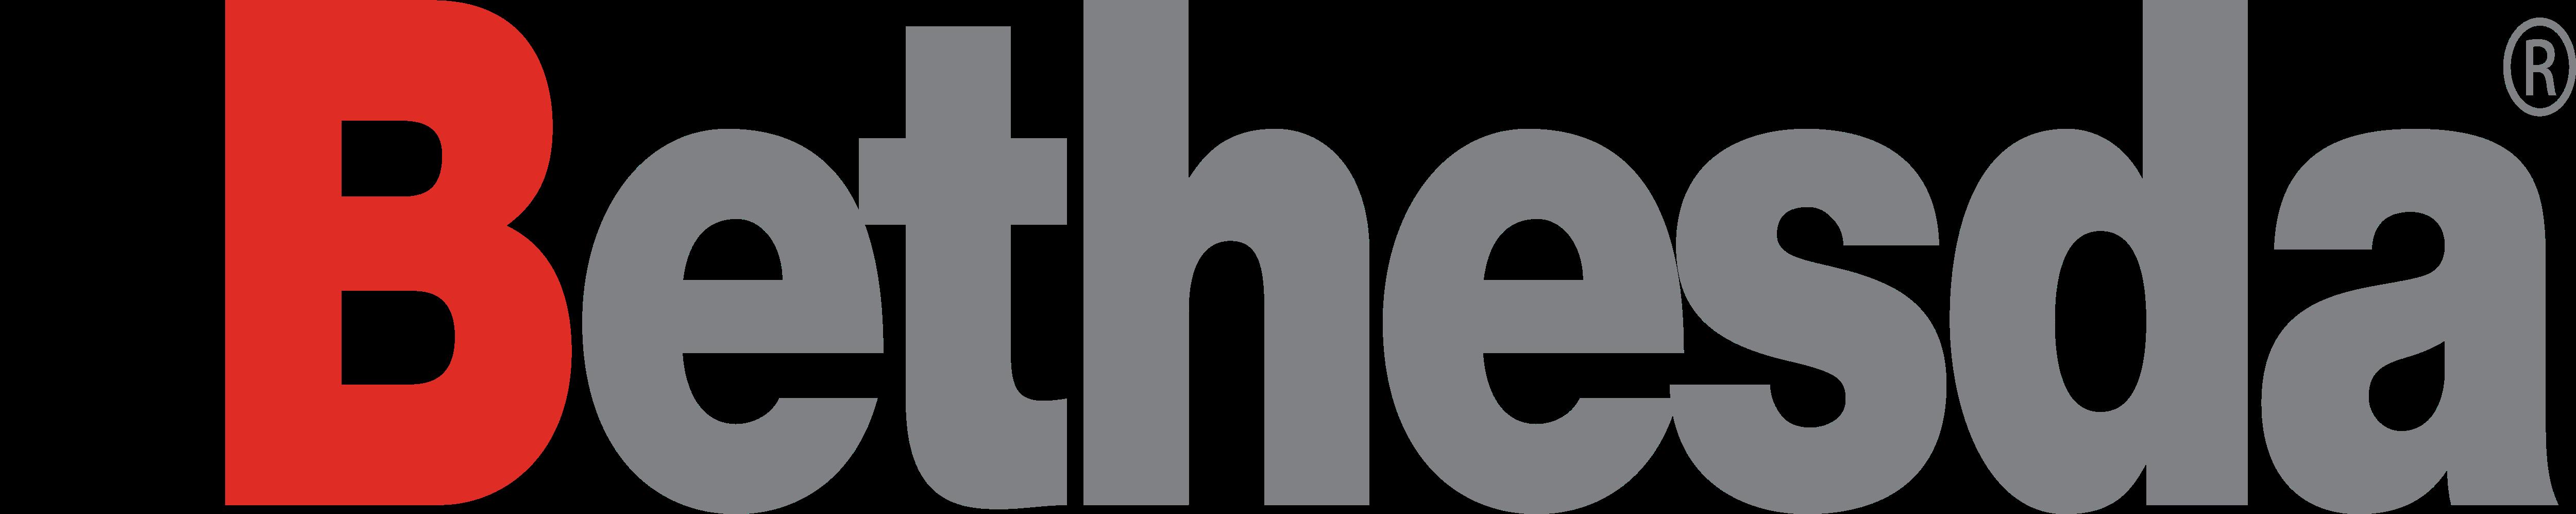 Bethesda Softworks – Logos Download